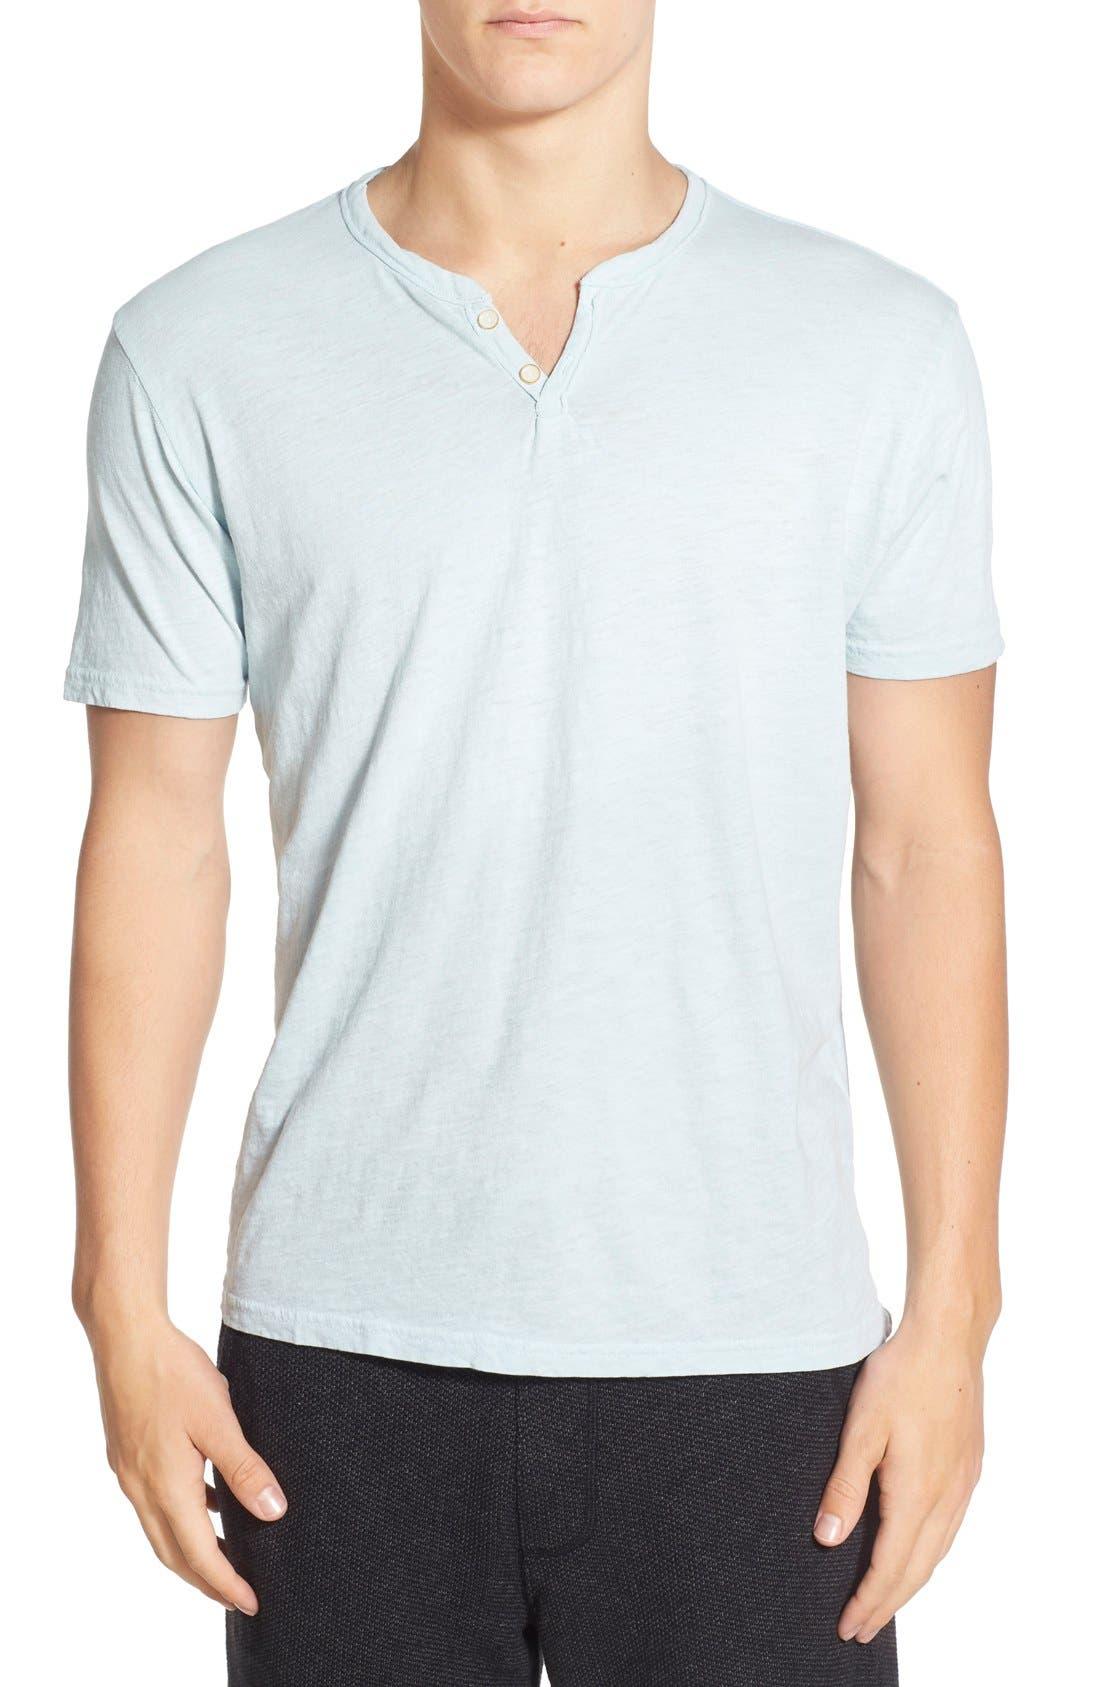 Alternate Image 1 Selected - Lucky Brand Notch Short Sleeve Henley T-Shirt